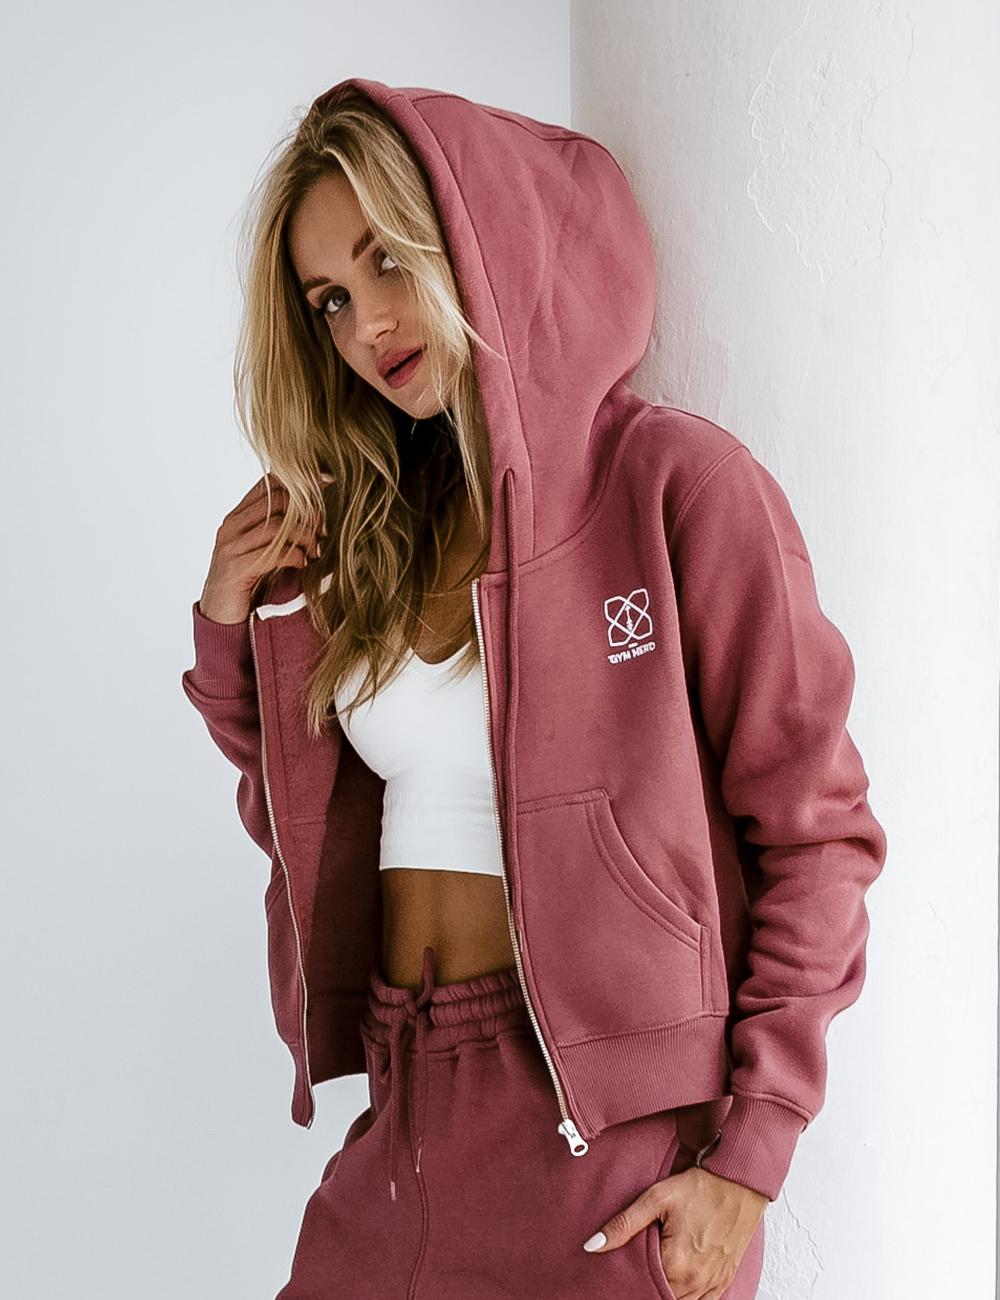 Bluza Crop Zip Zgaszony Róż - Gymhero